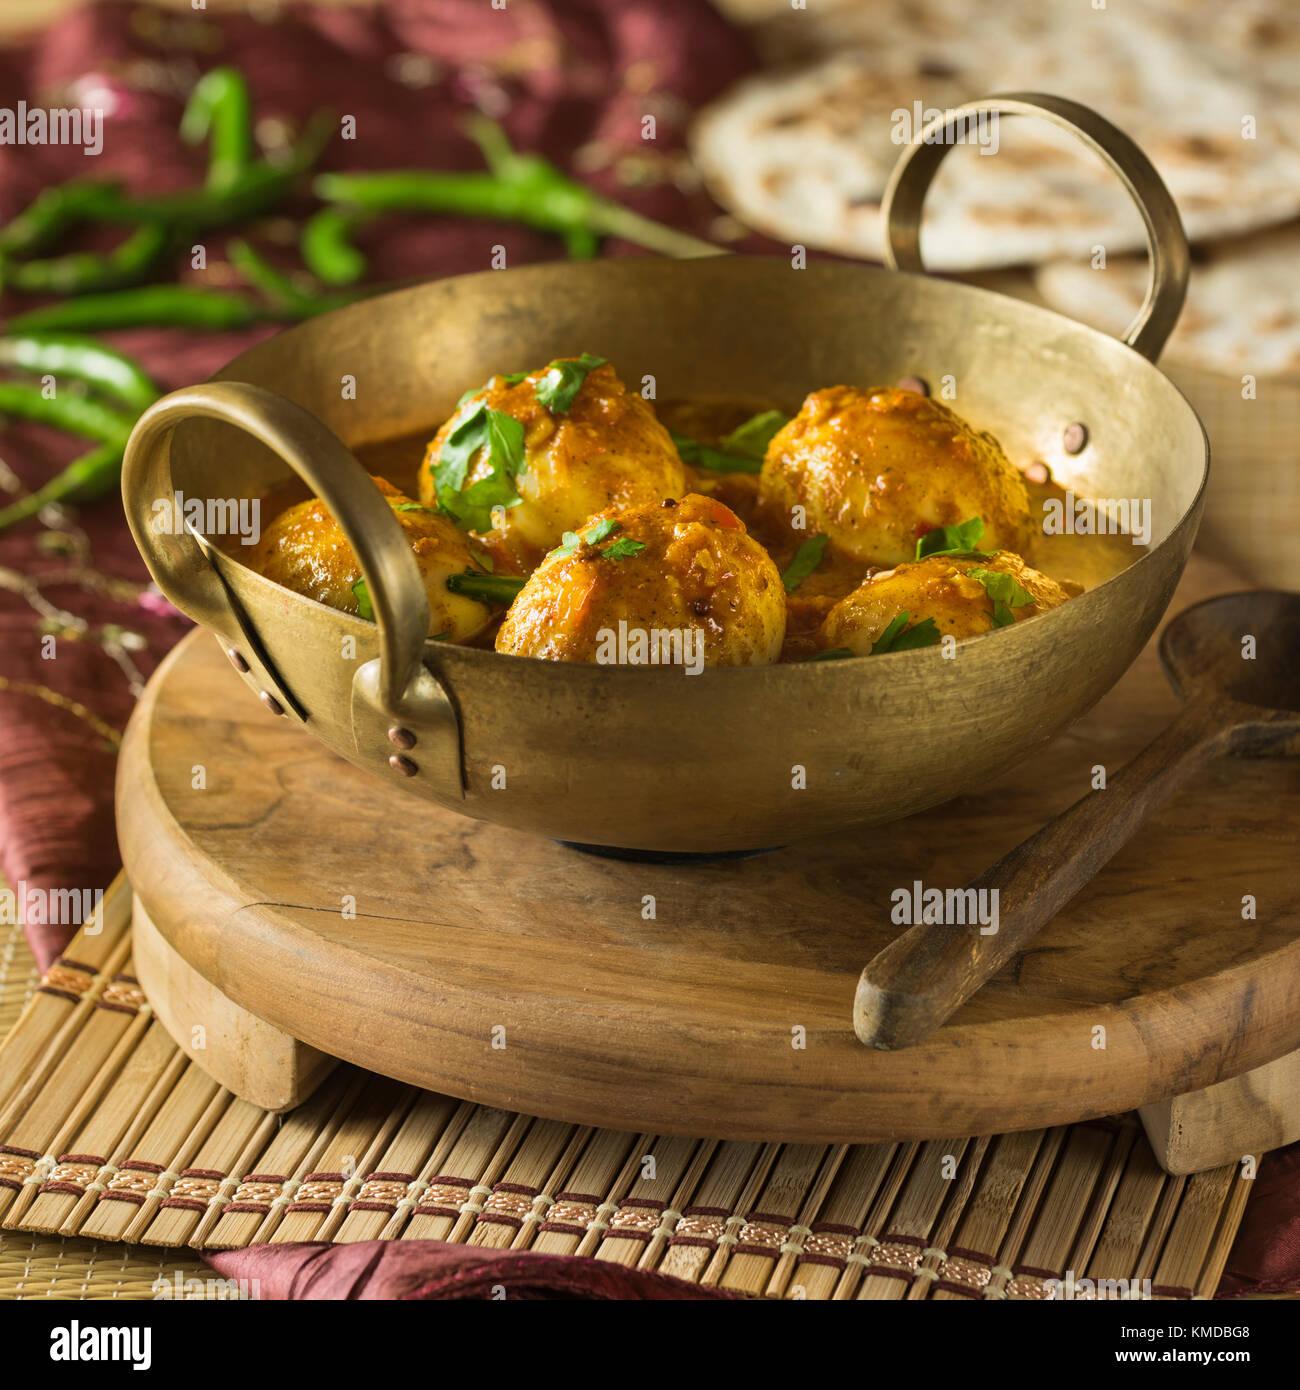 Eggs masala. Egg curry. India Food - Stock Image